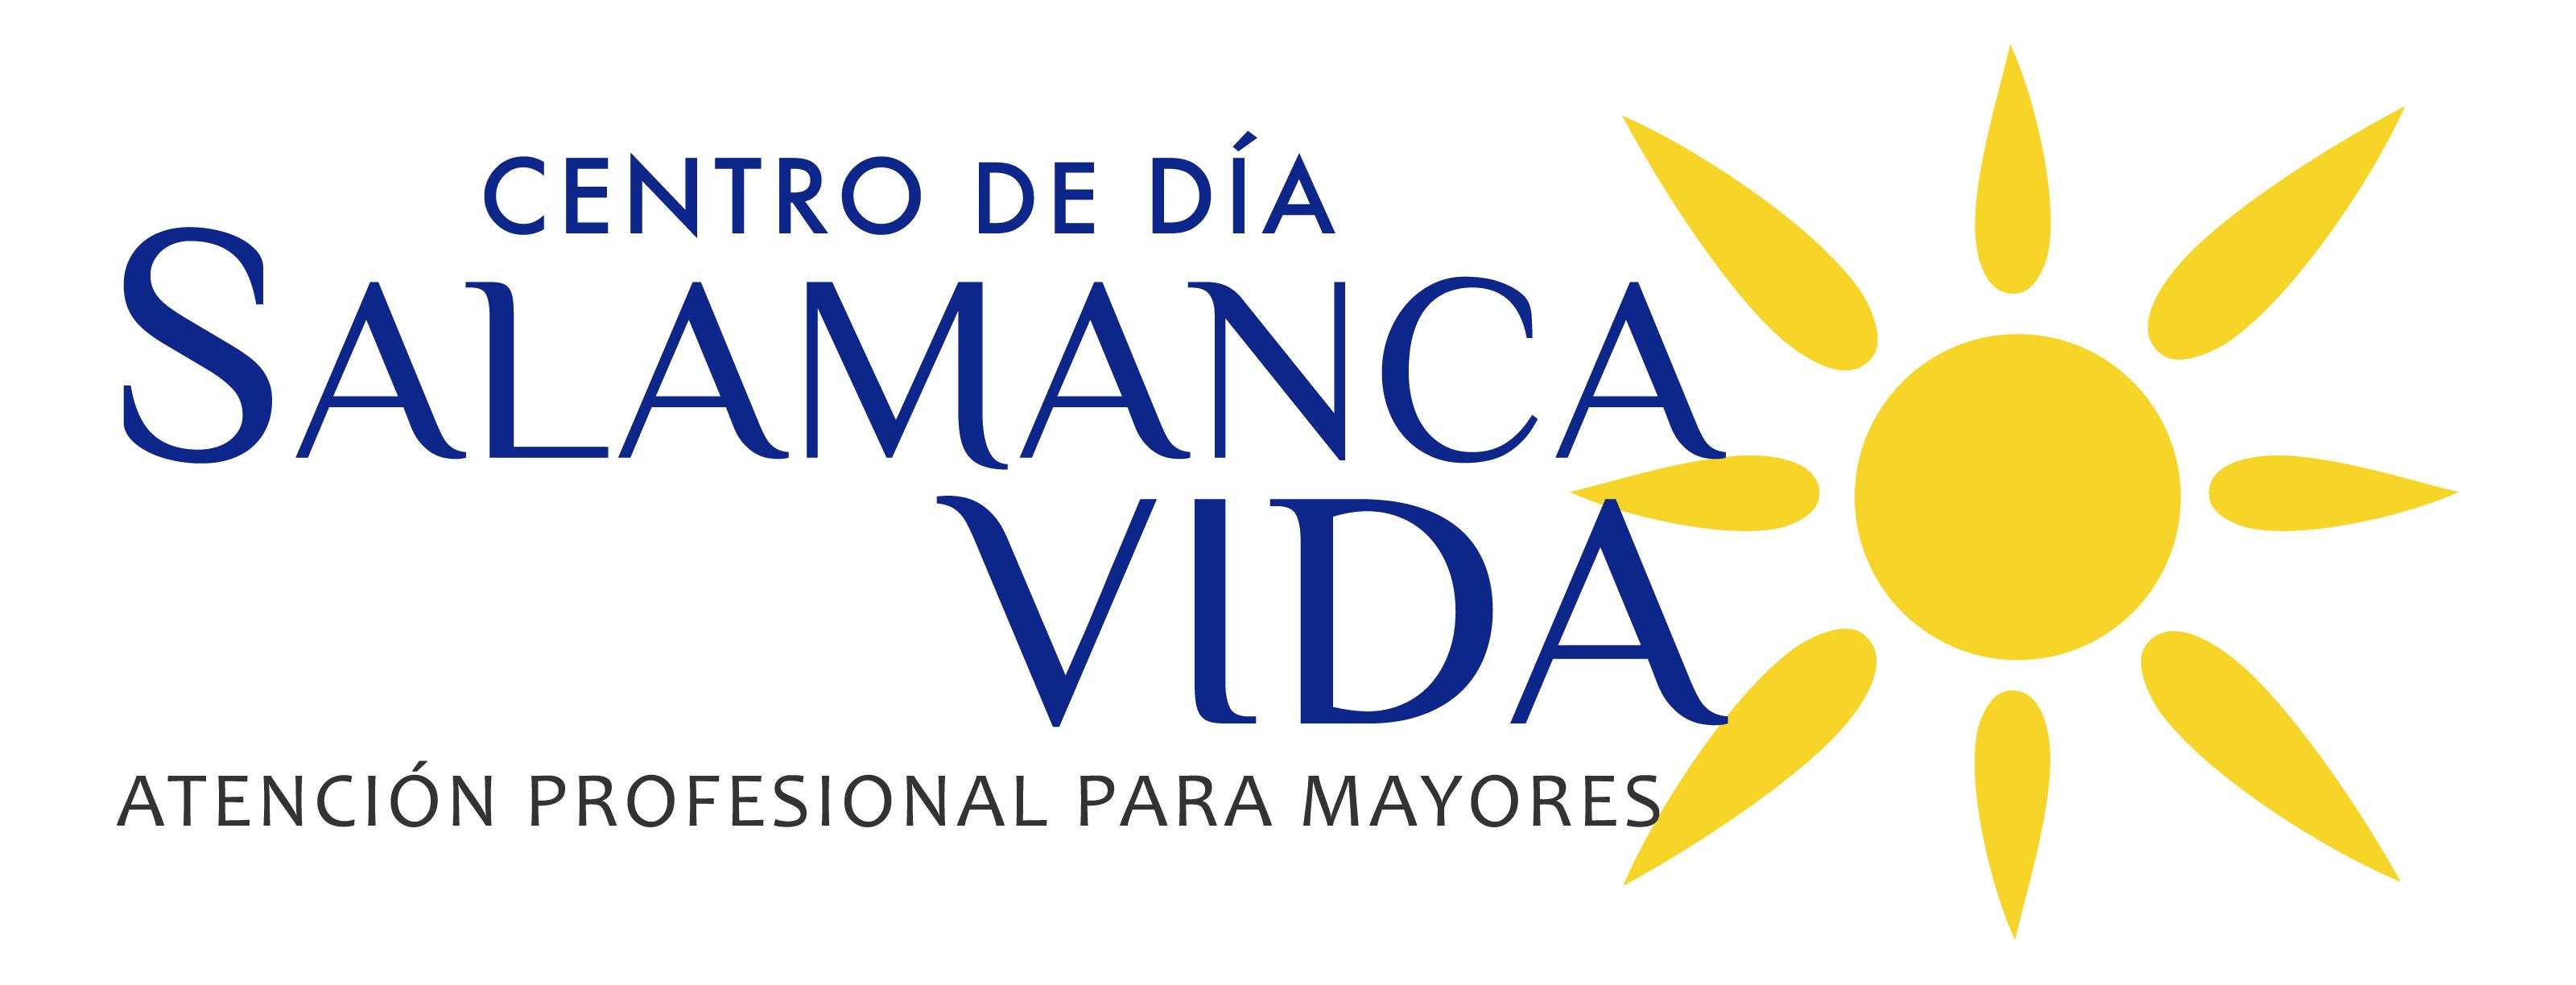 Centro de Día Salamanca Vida